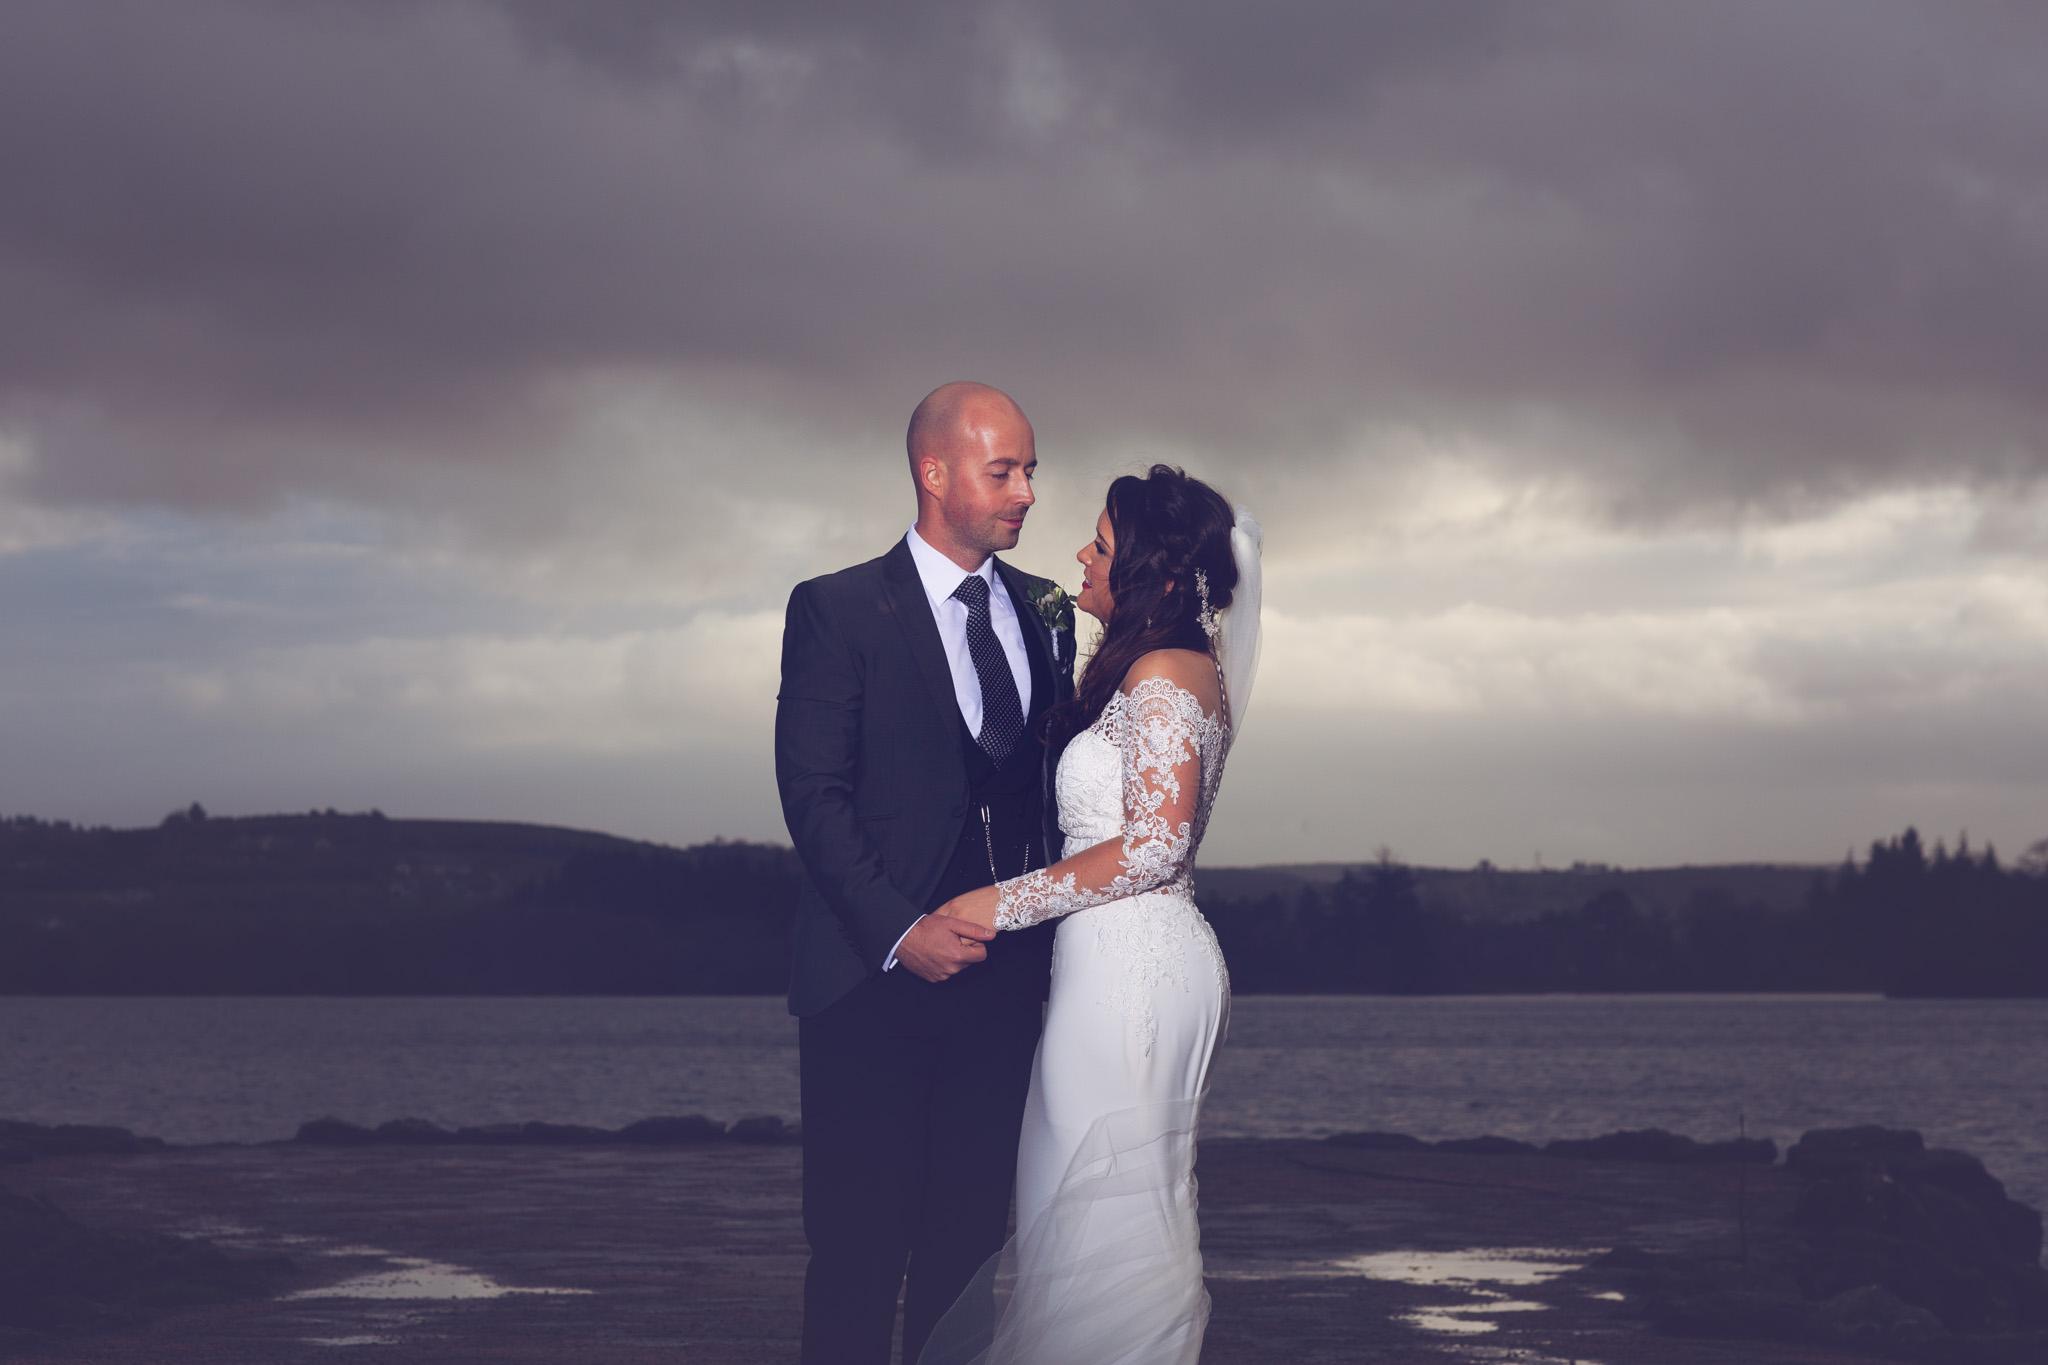 Mark_Barnes_Northern_Ireland_wedding_photographer_Harveys_Point_Donegall_Wedding_photography-Adam&Gemma-41.jpg